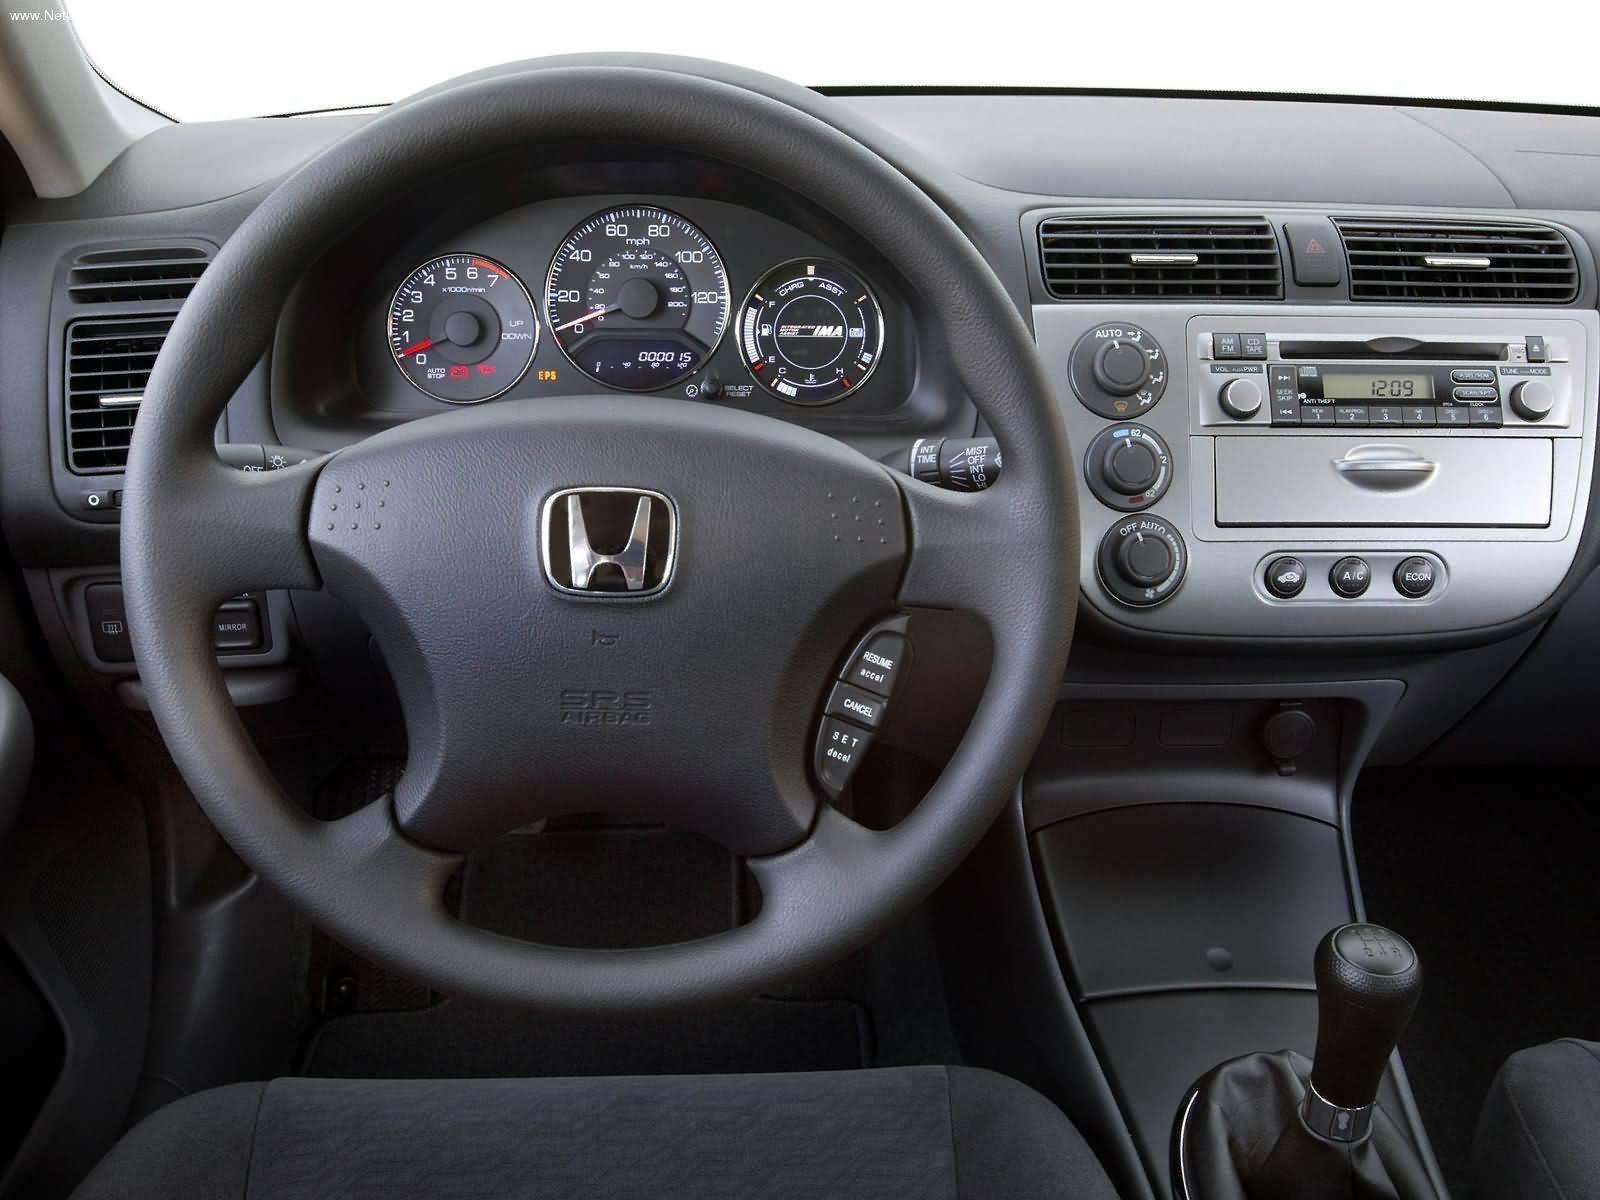 Honda Civic Hybrid 2005 Honda Civic Hybrid Honda Honda Civic